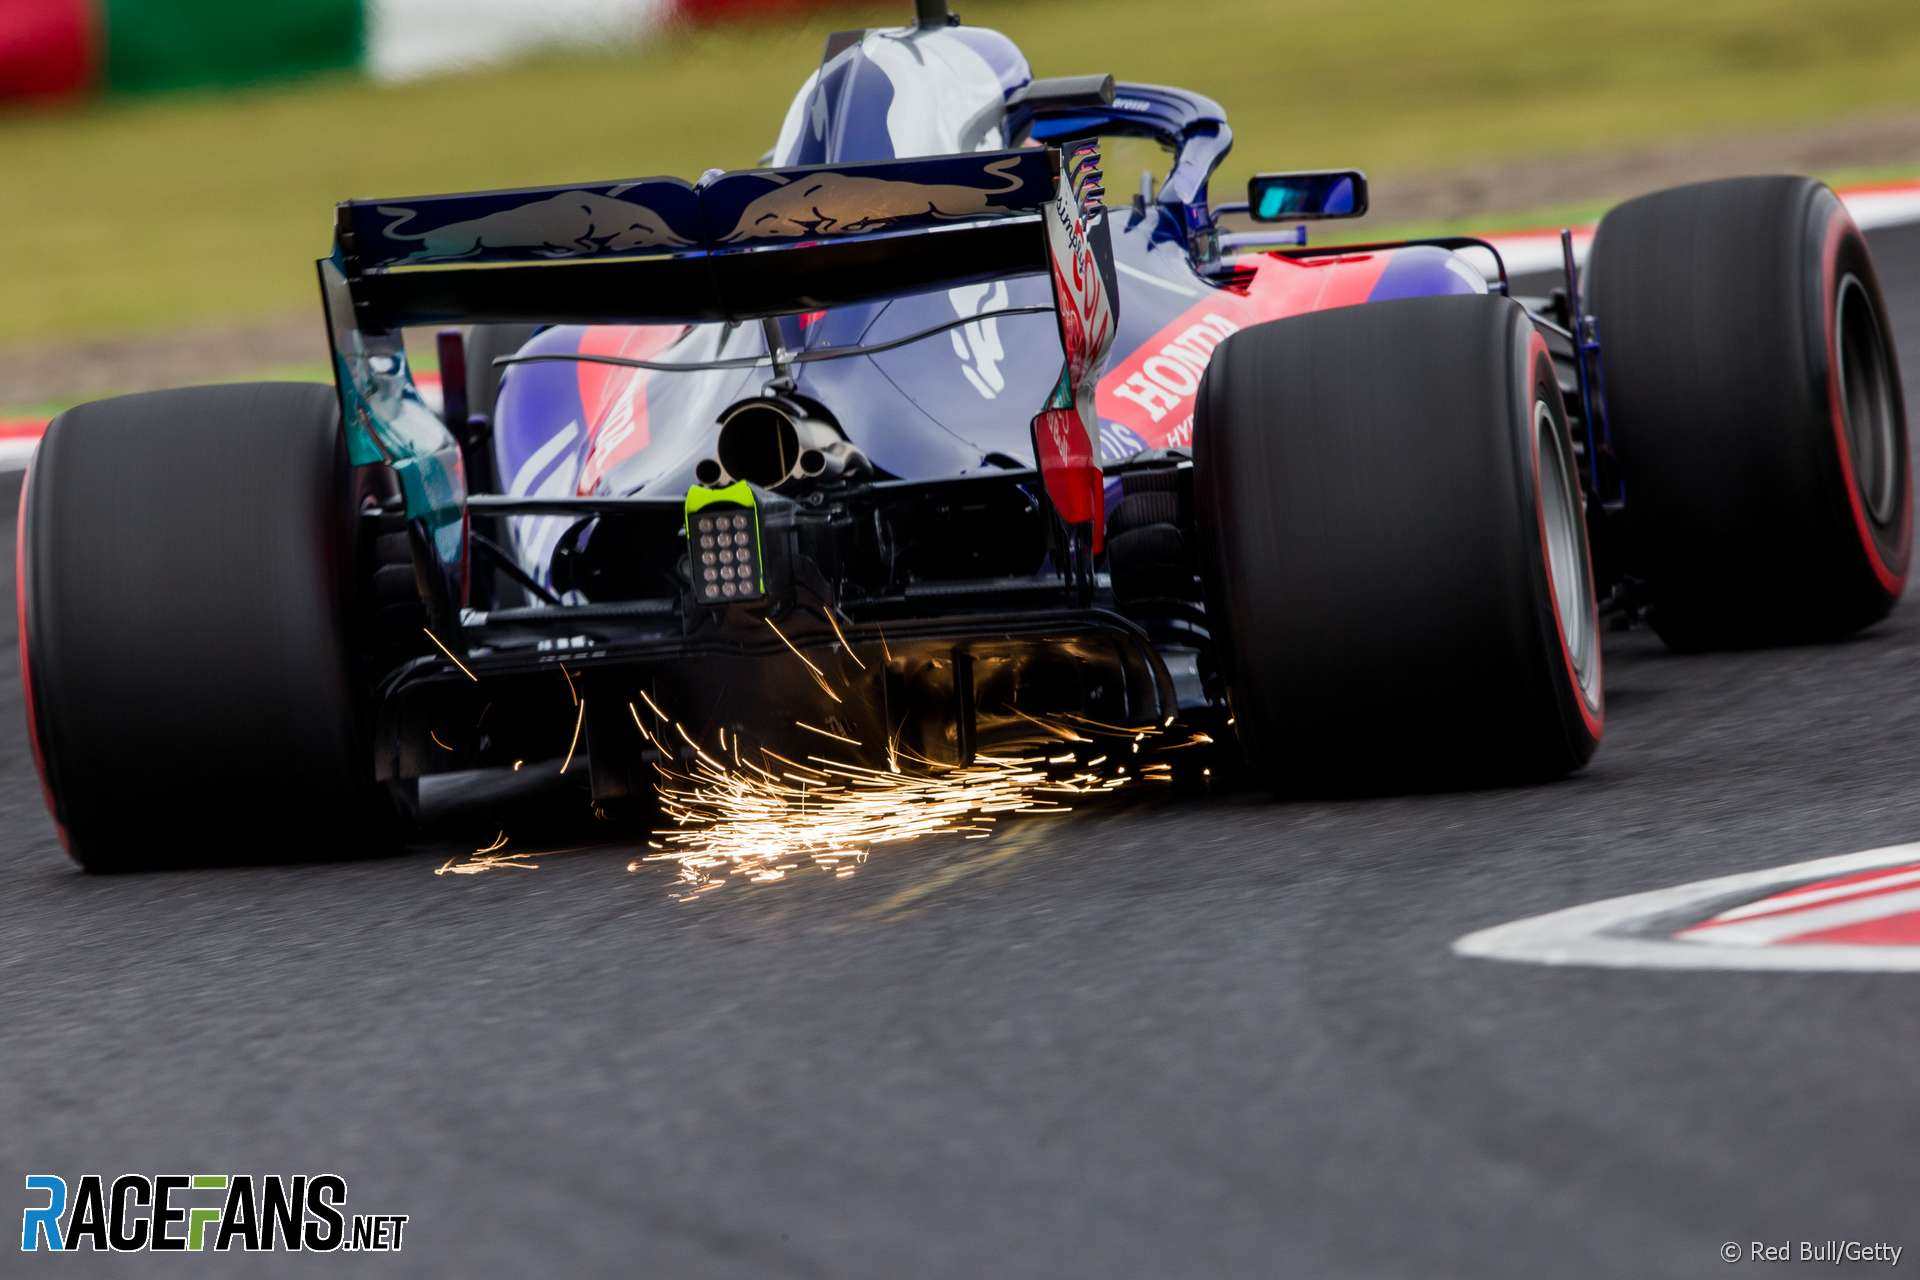 Pierre Gasly, Toro Rosso, Suzuka, 2018